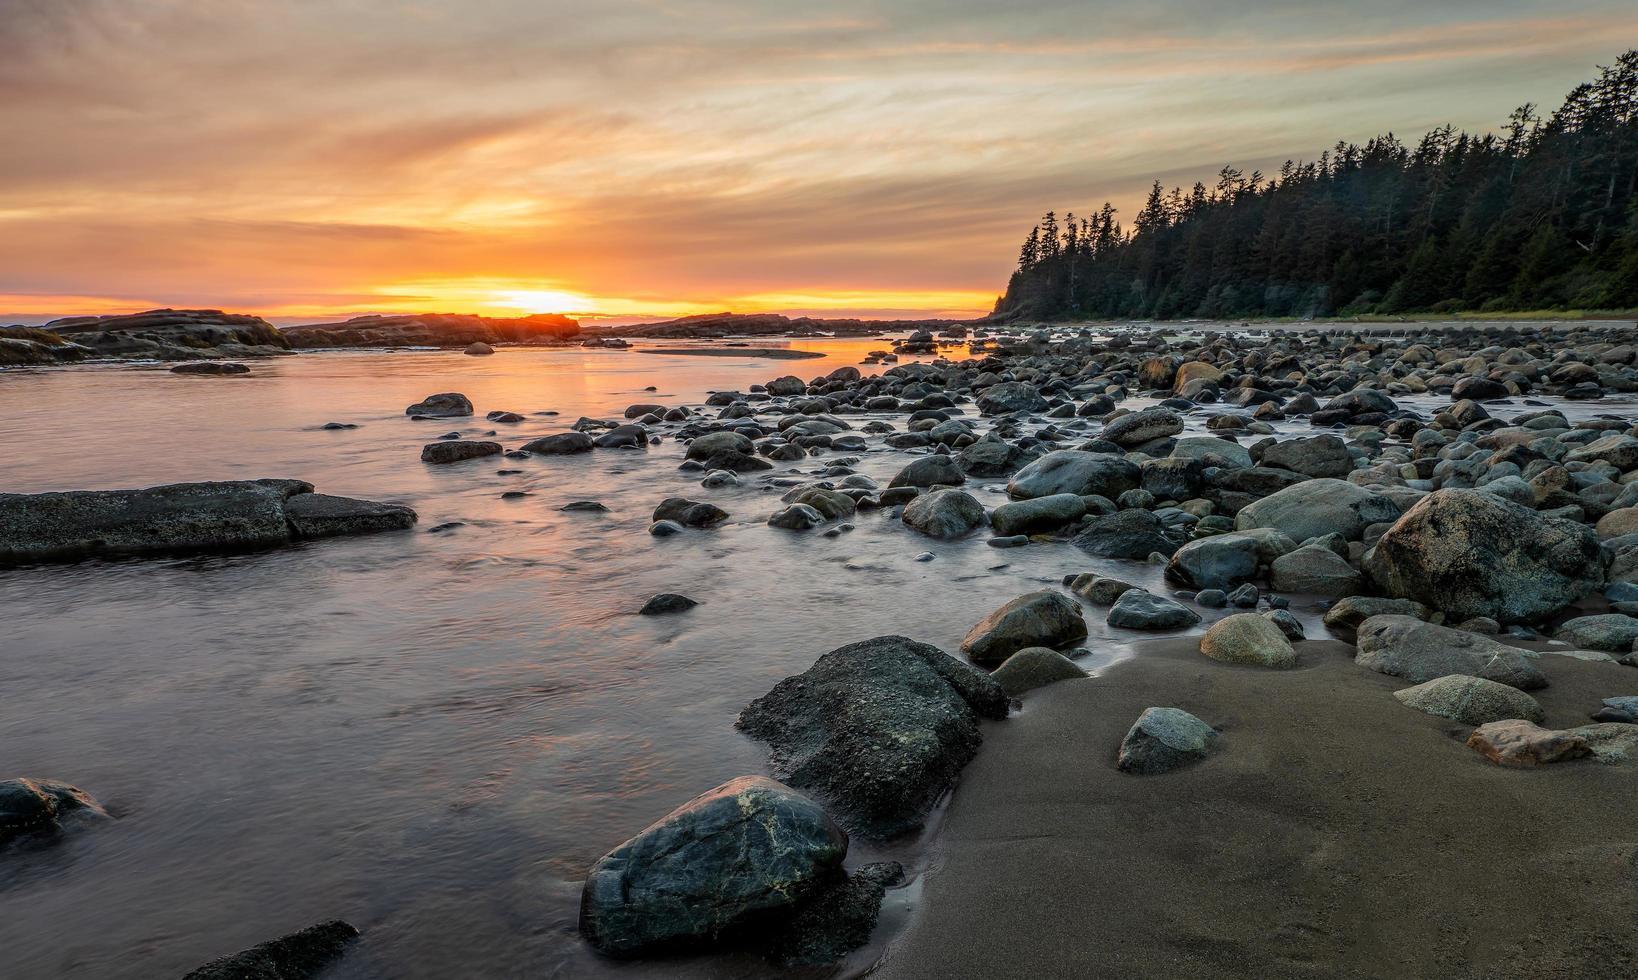 rotsachtige kust tijdens zonsondergang foto